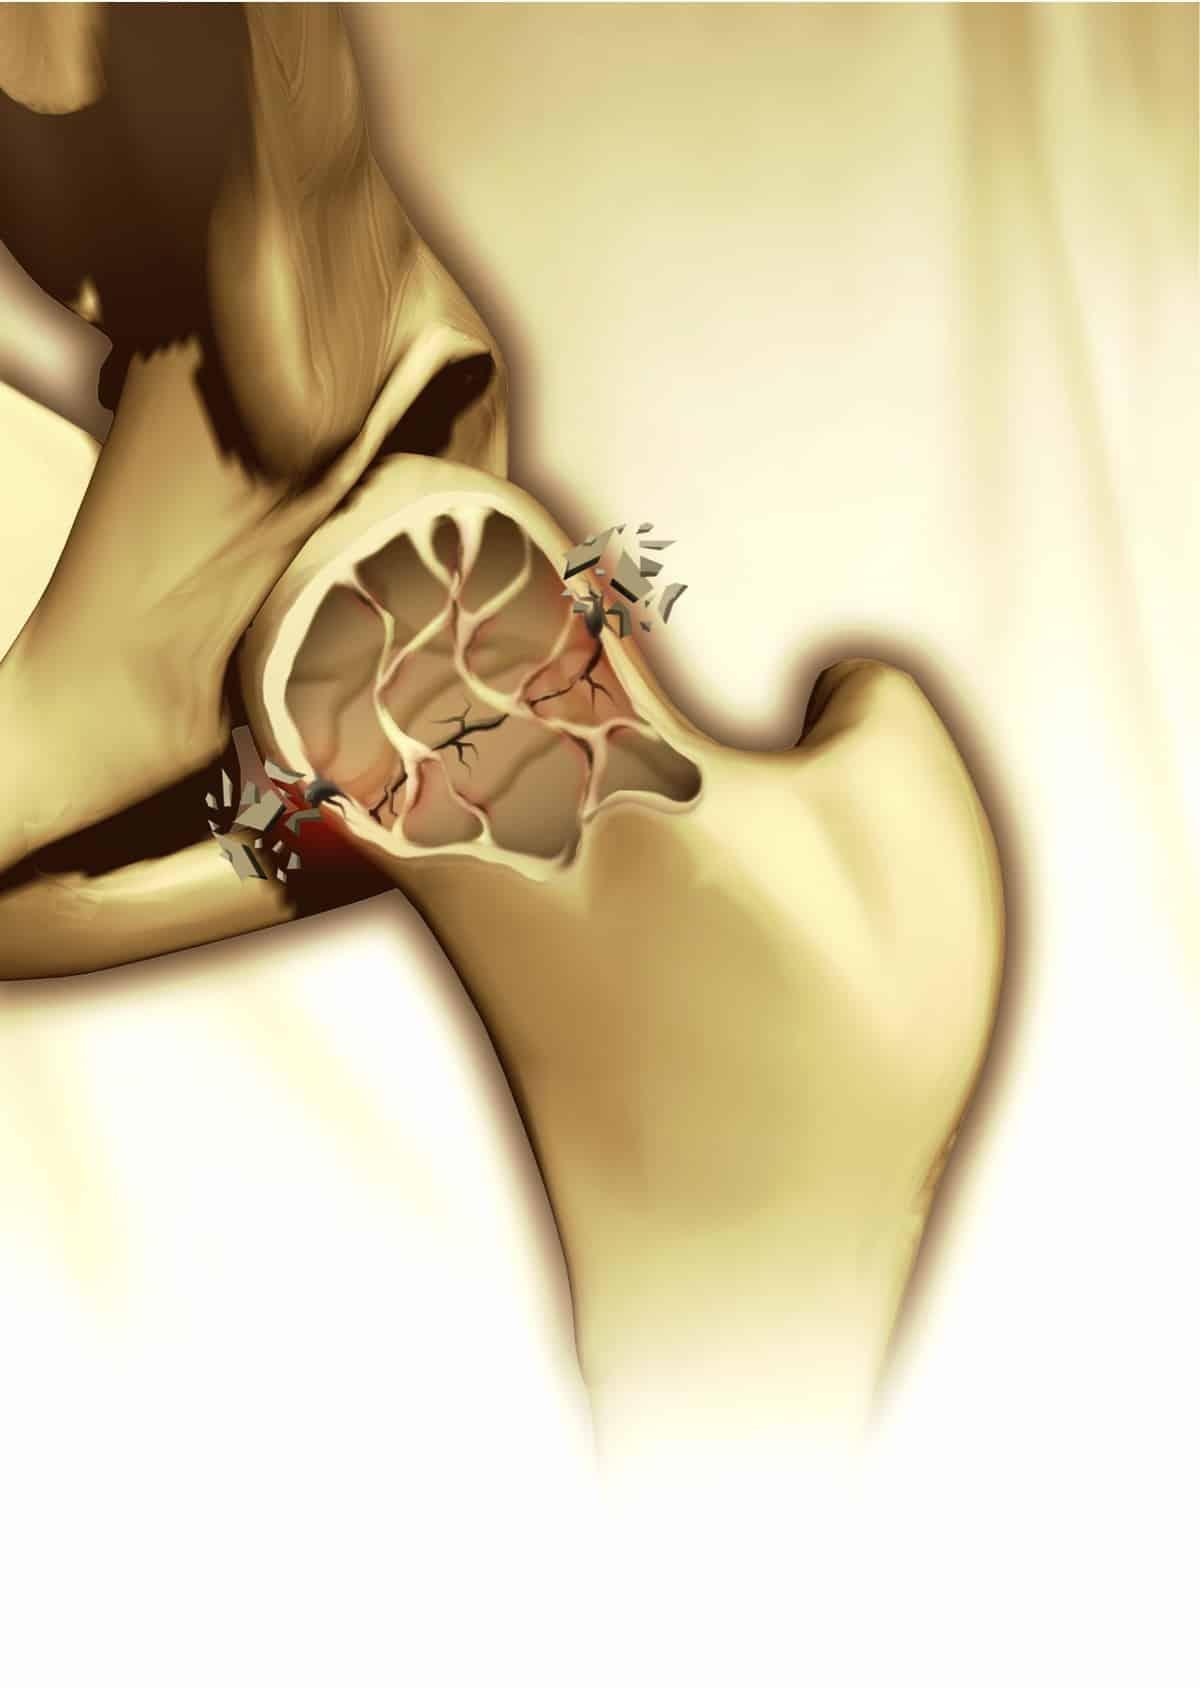 cópia de Osteoporose